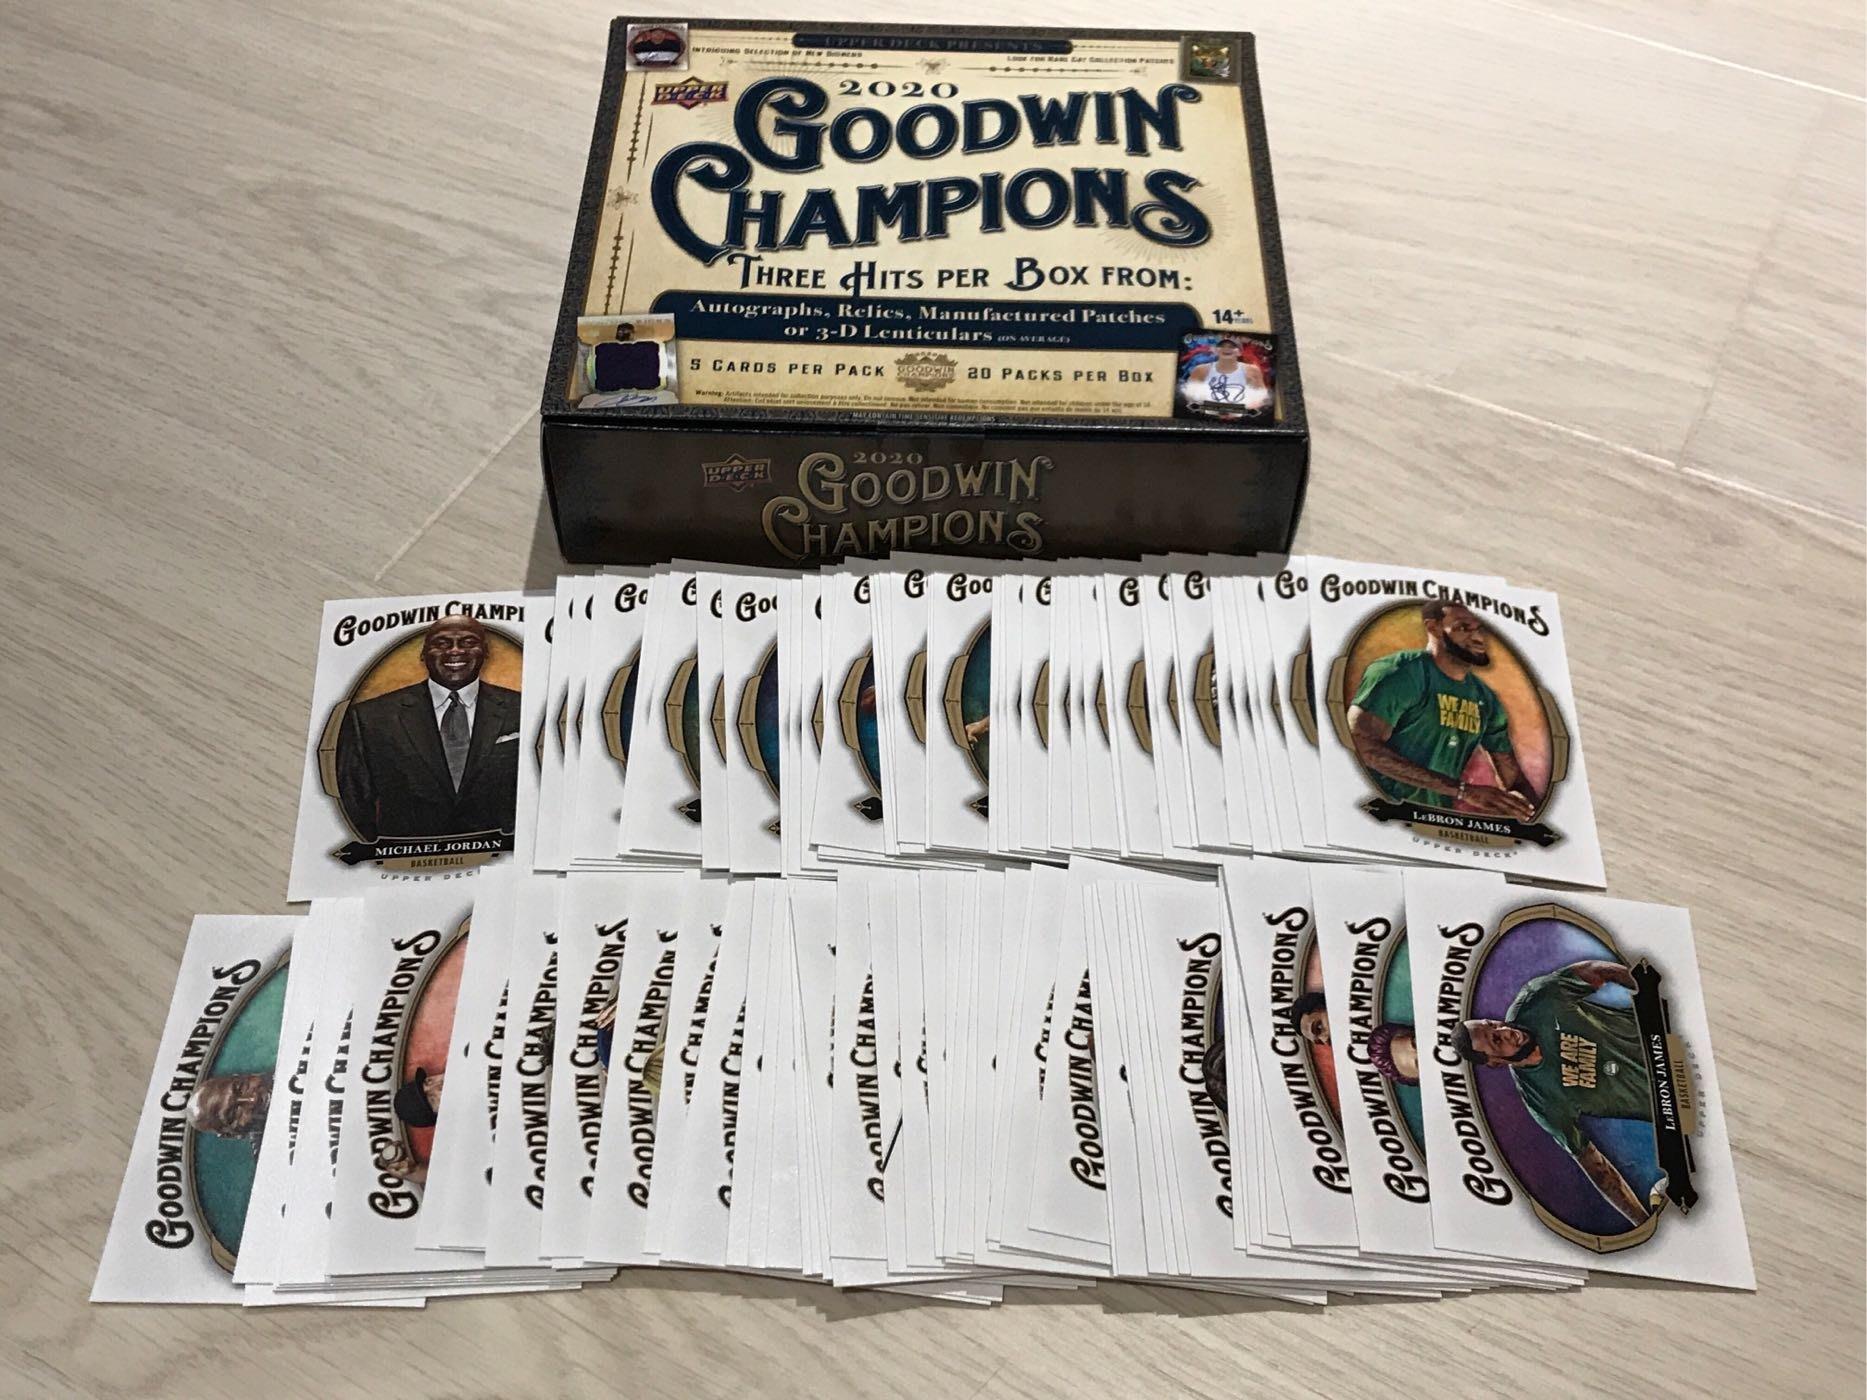 2020 Goodwin 全套普卡 (編號1-100)